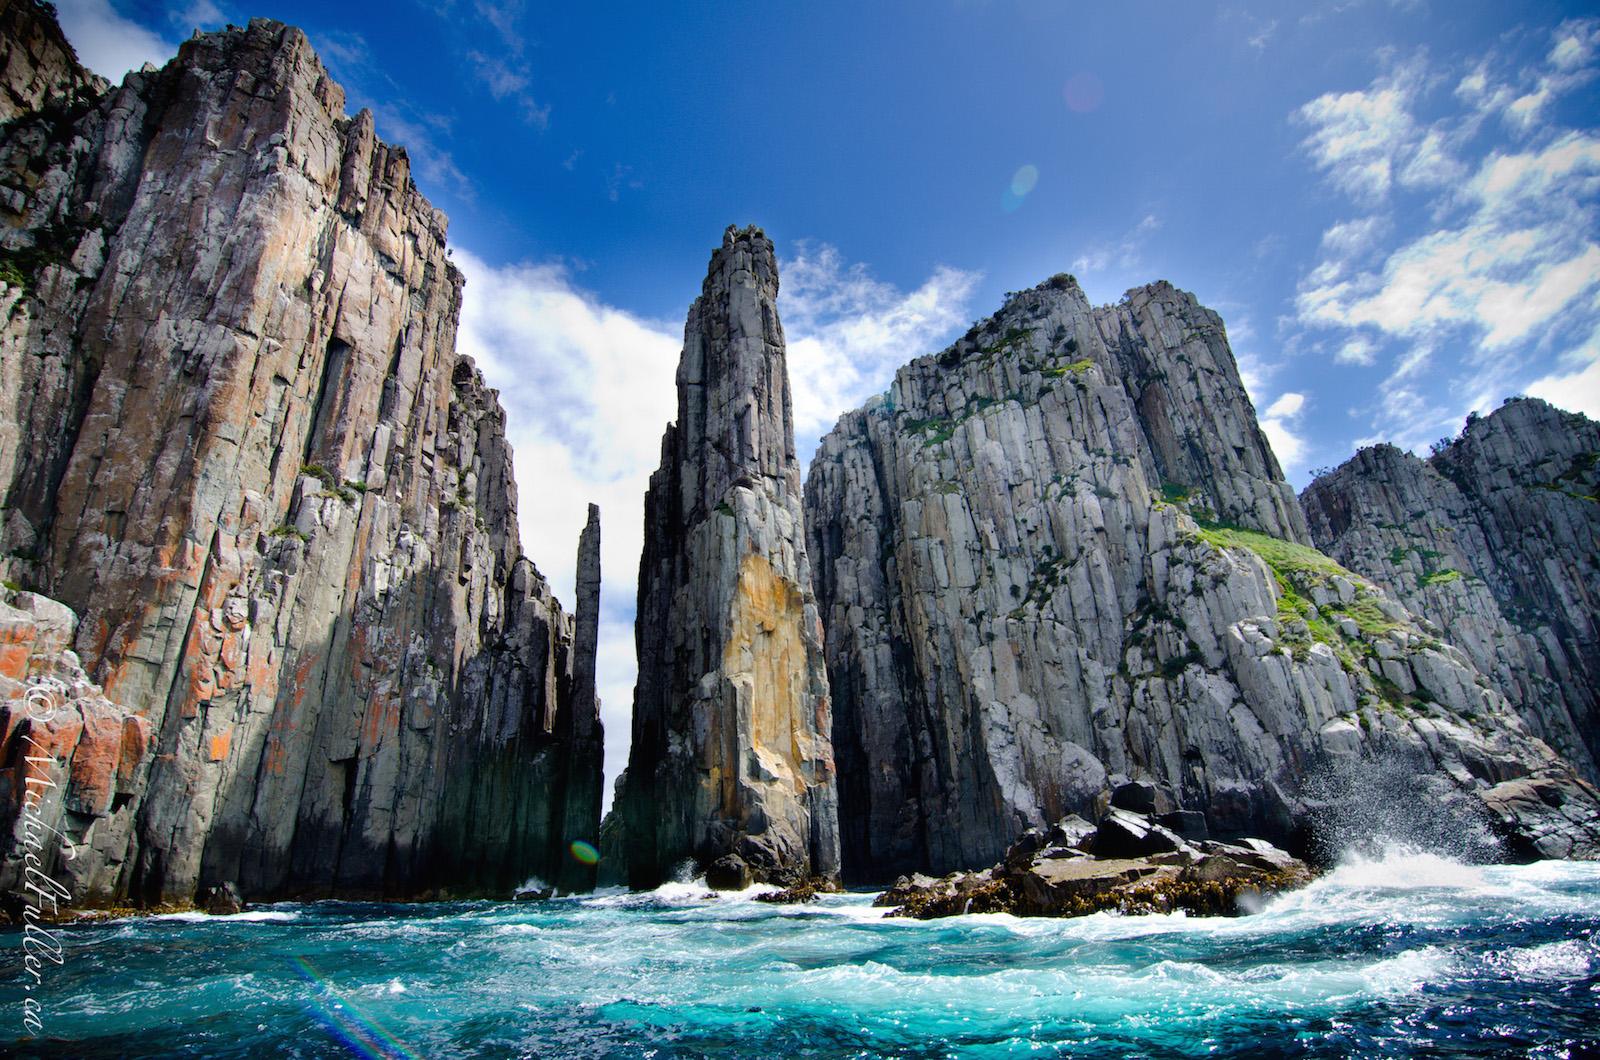 Australia - Candlestick and Totem Pole 5352342270[H]